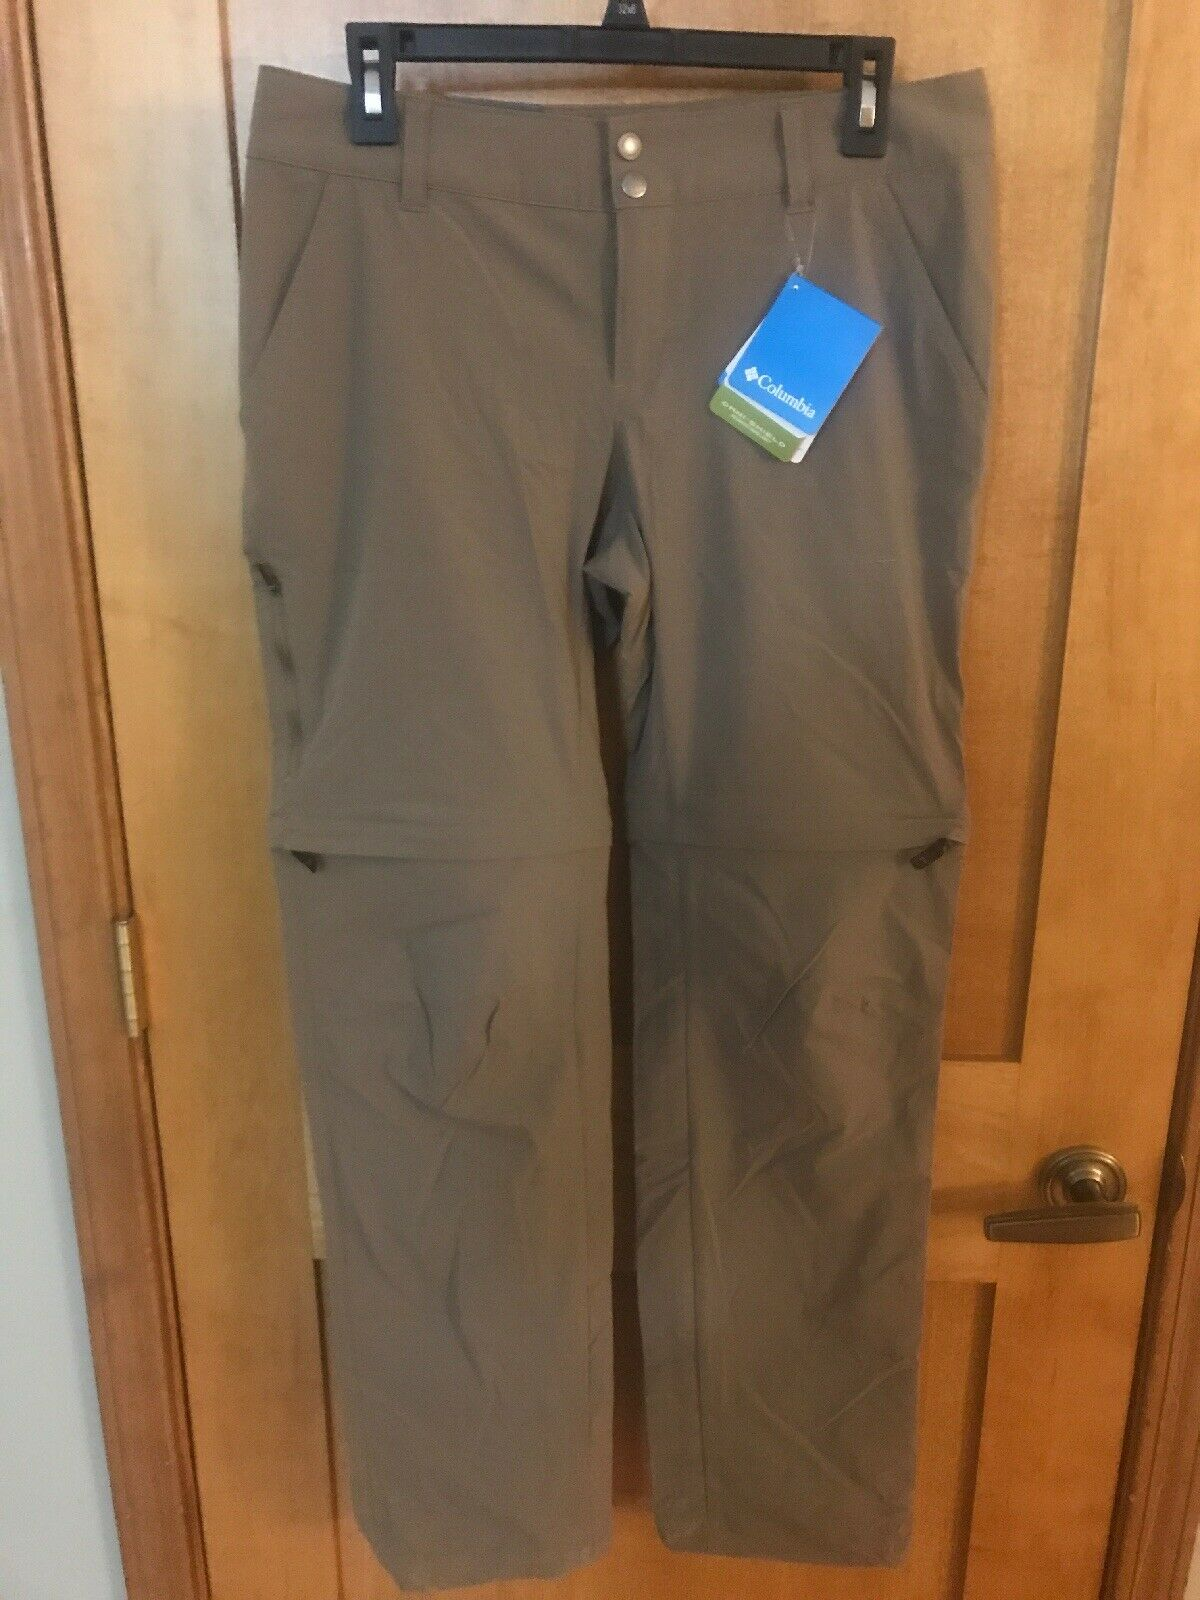 NWT Columbia Womens Saturday Trail II Congreenible Pants - Tan - size 10